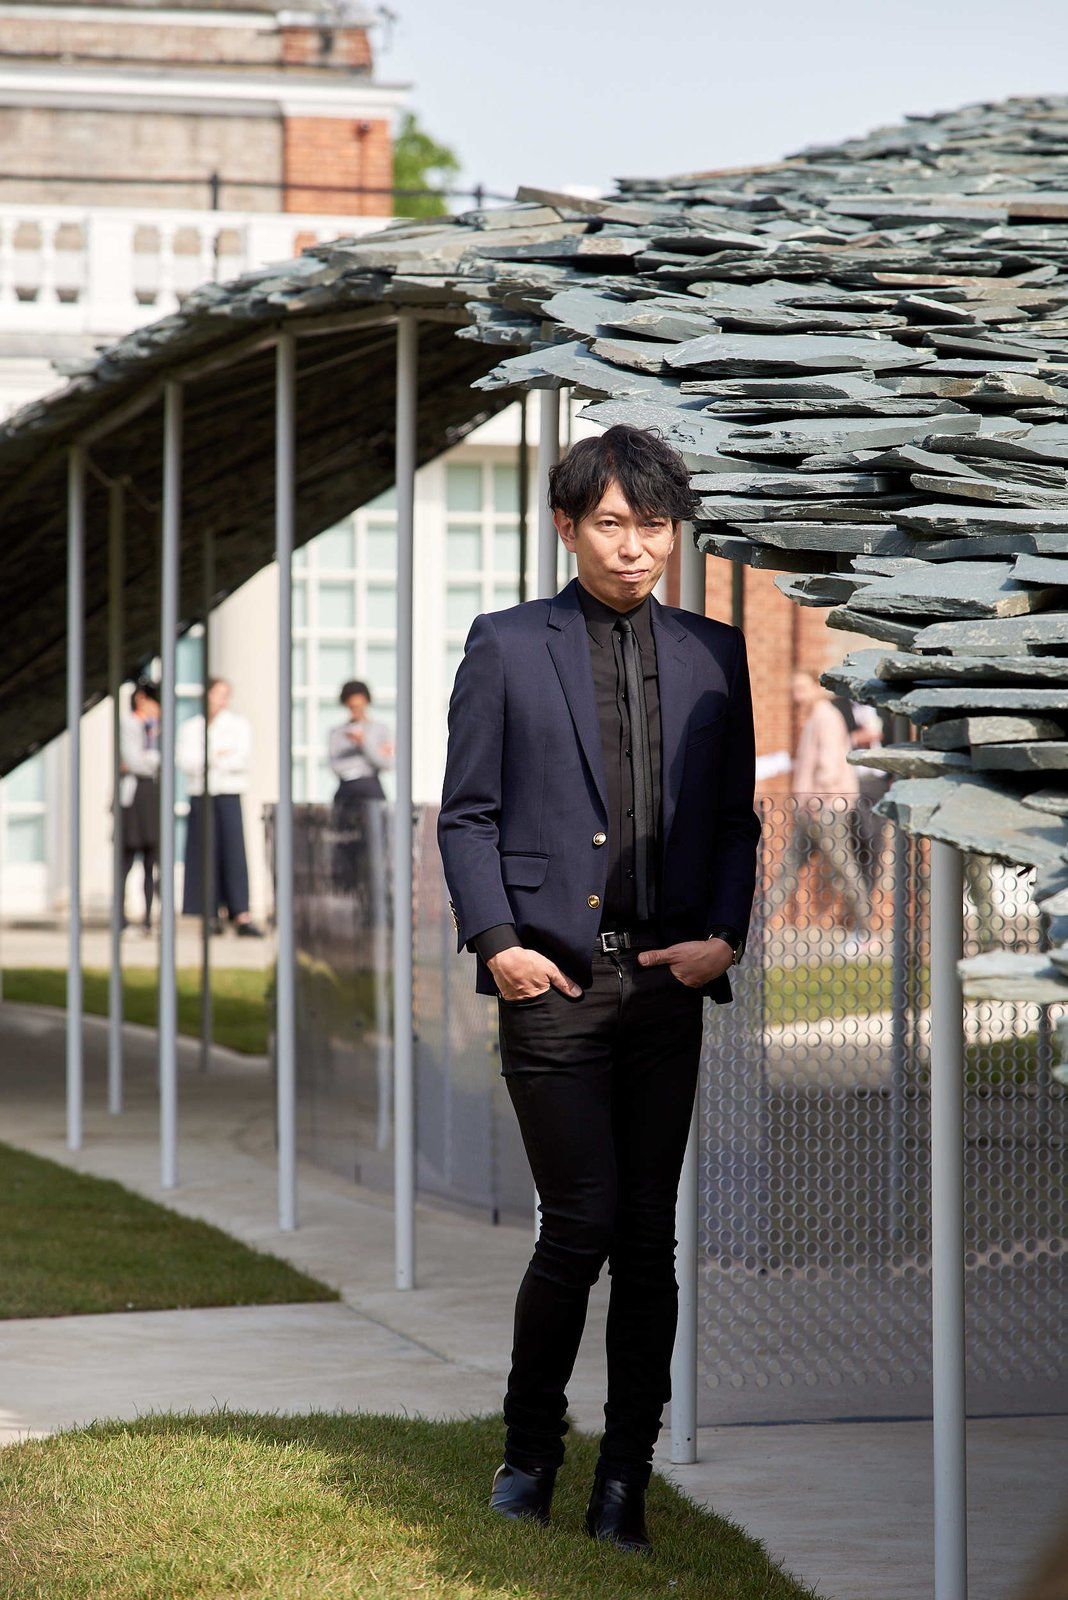 Junya Ishigami's Serpentine Pavilion Descends Upon London Like a Giant Black Bird